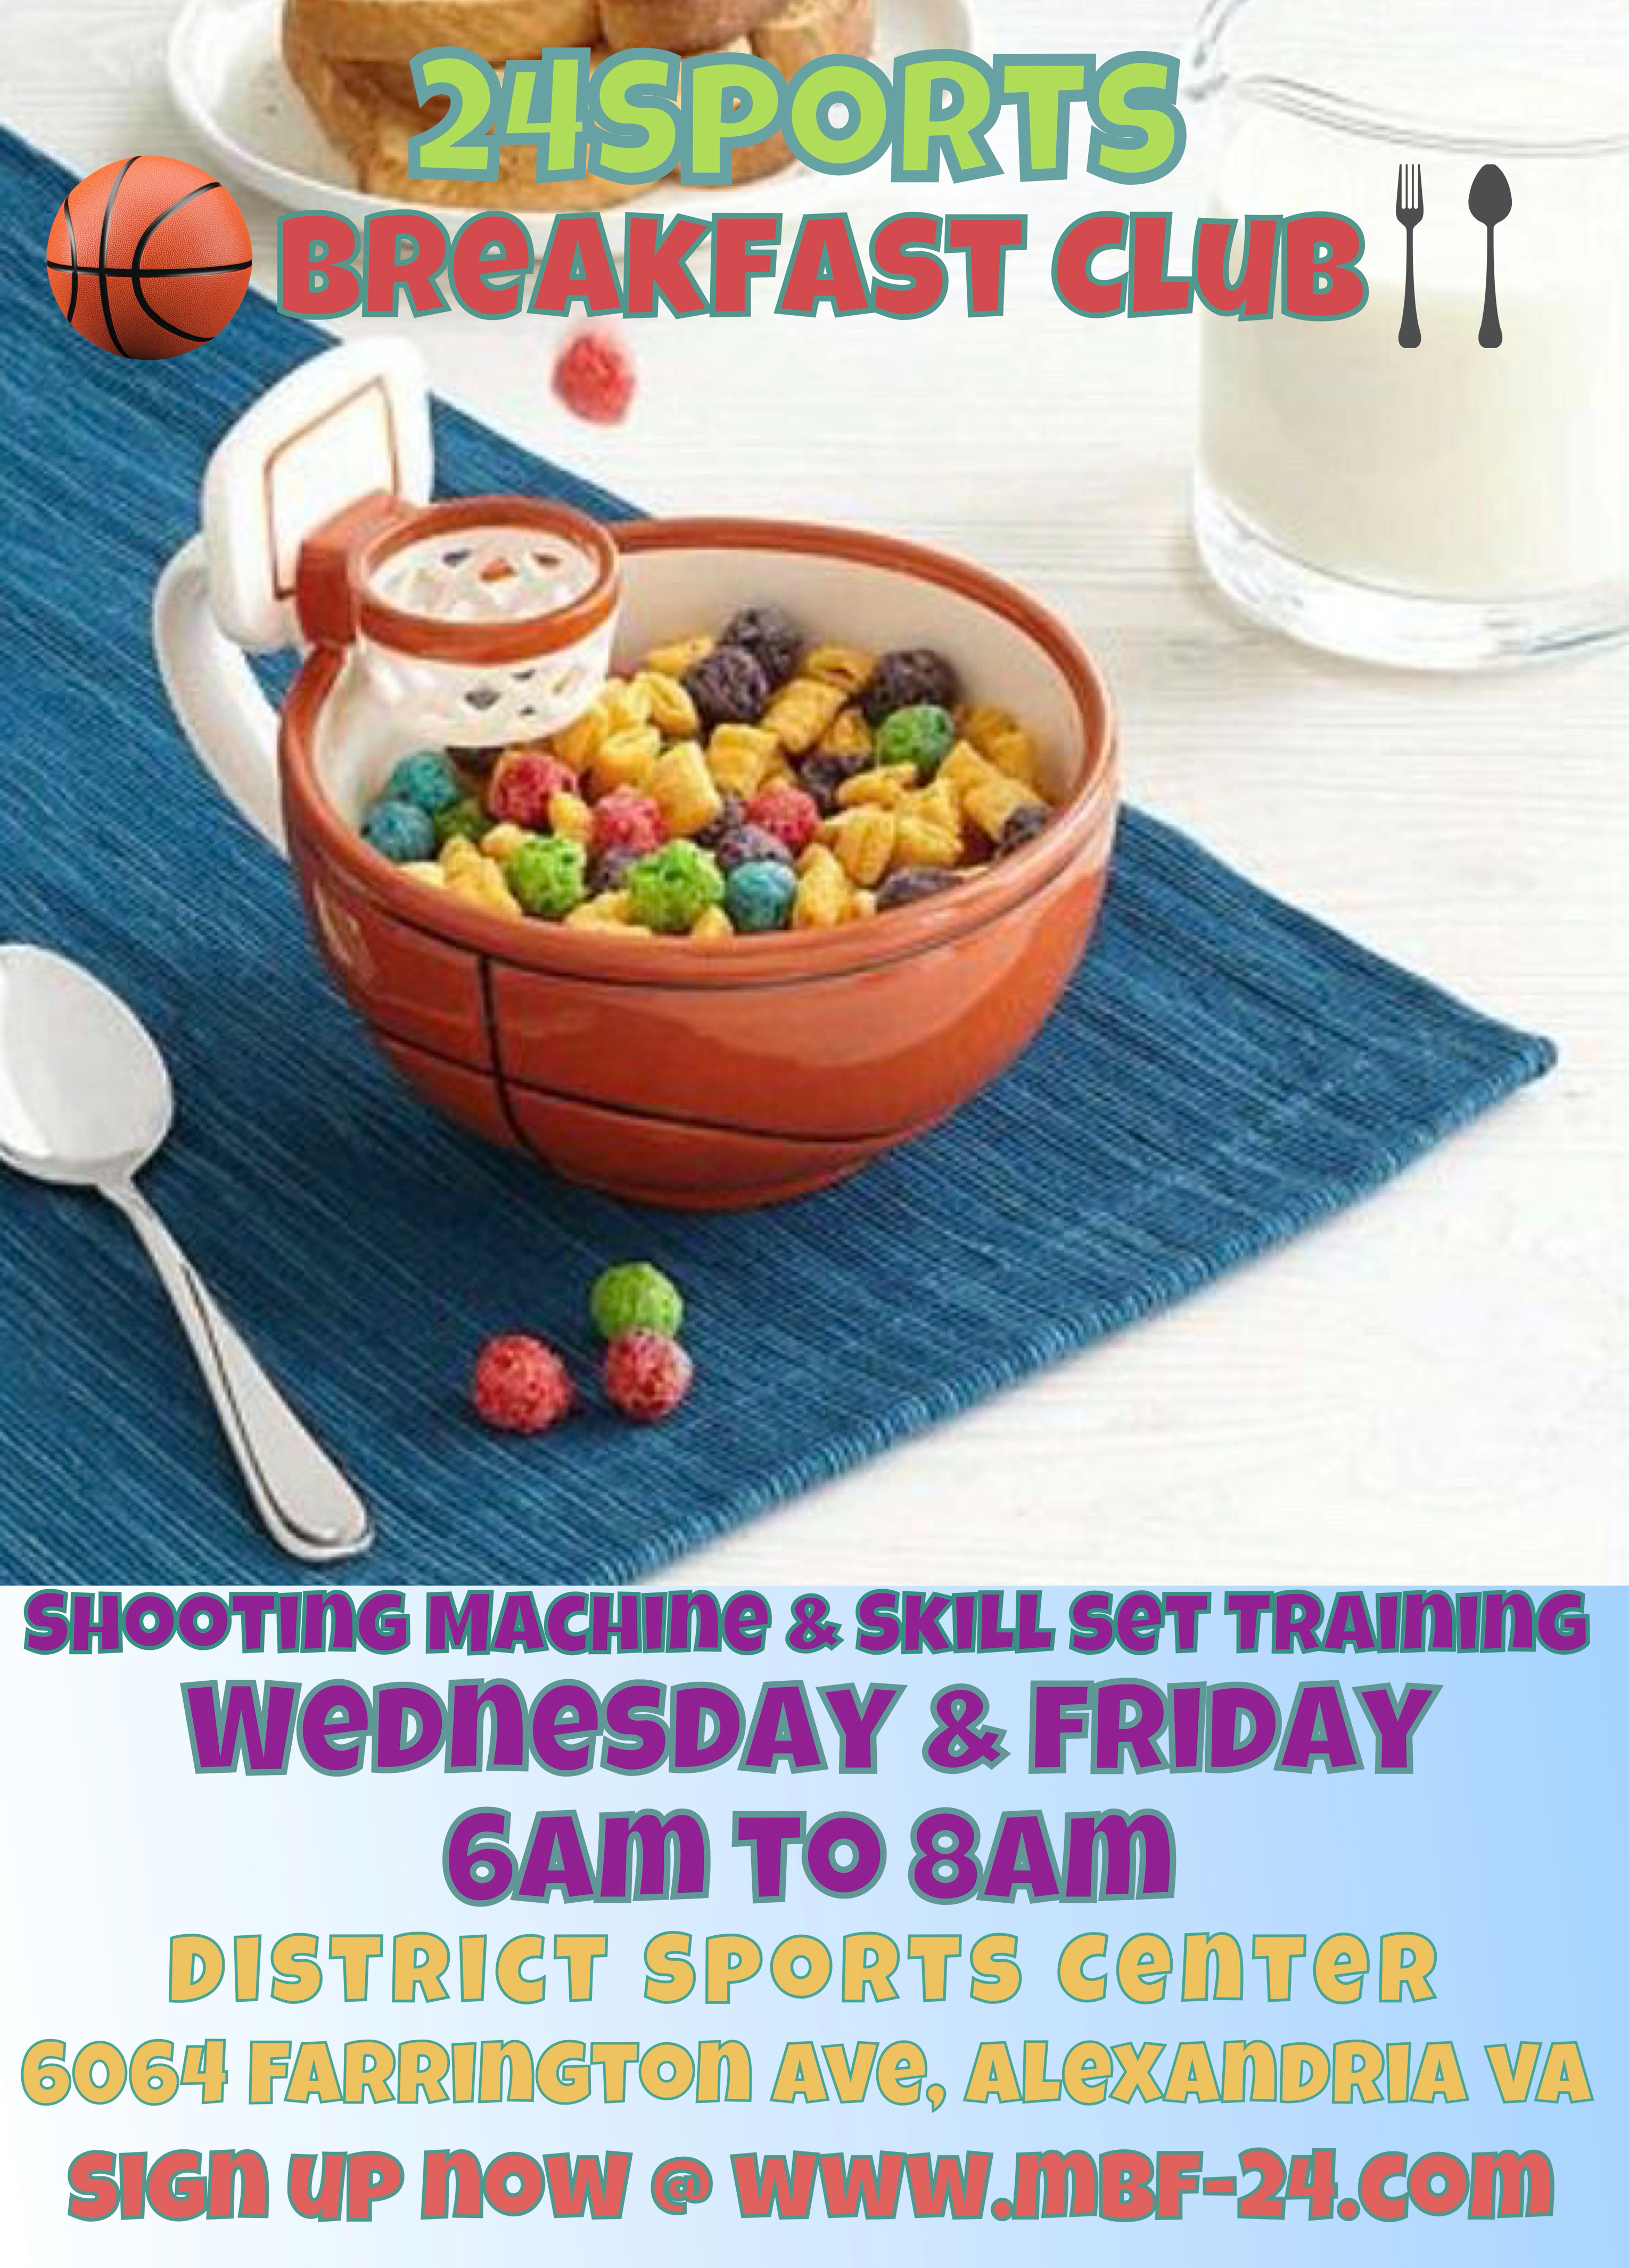 Breakfast Club AM Workout